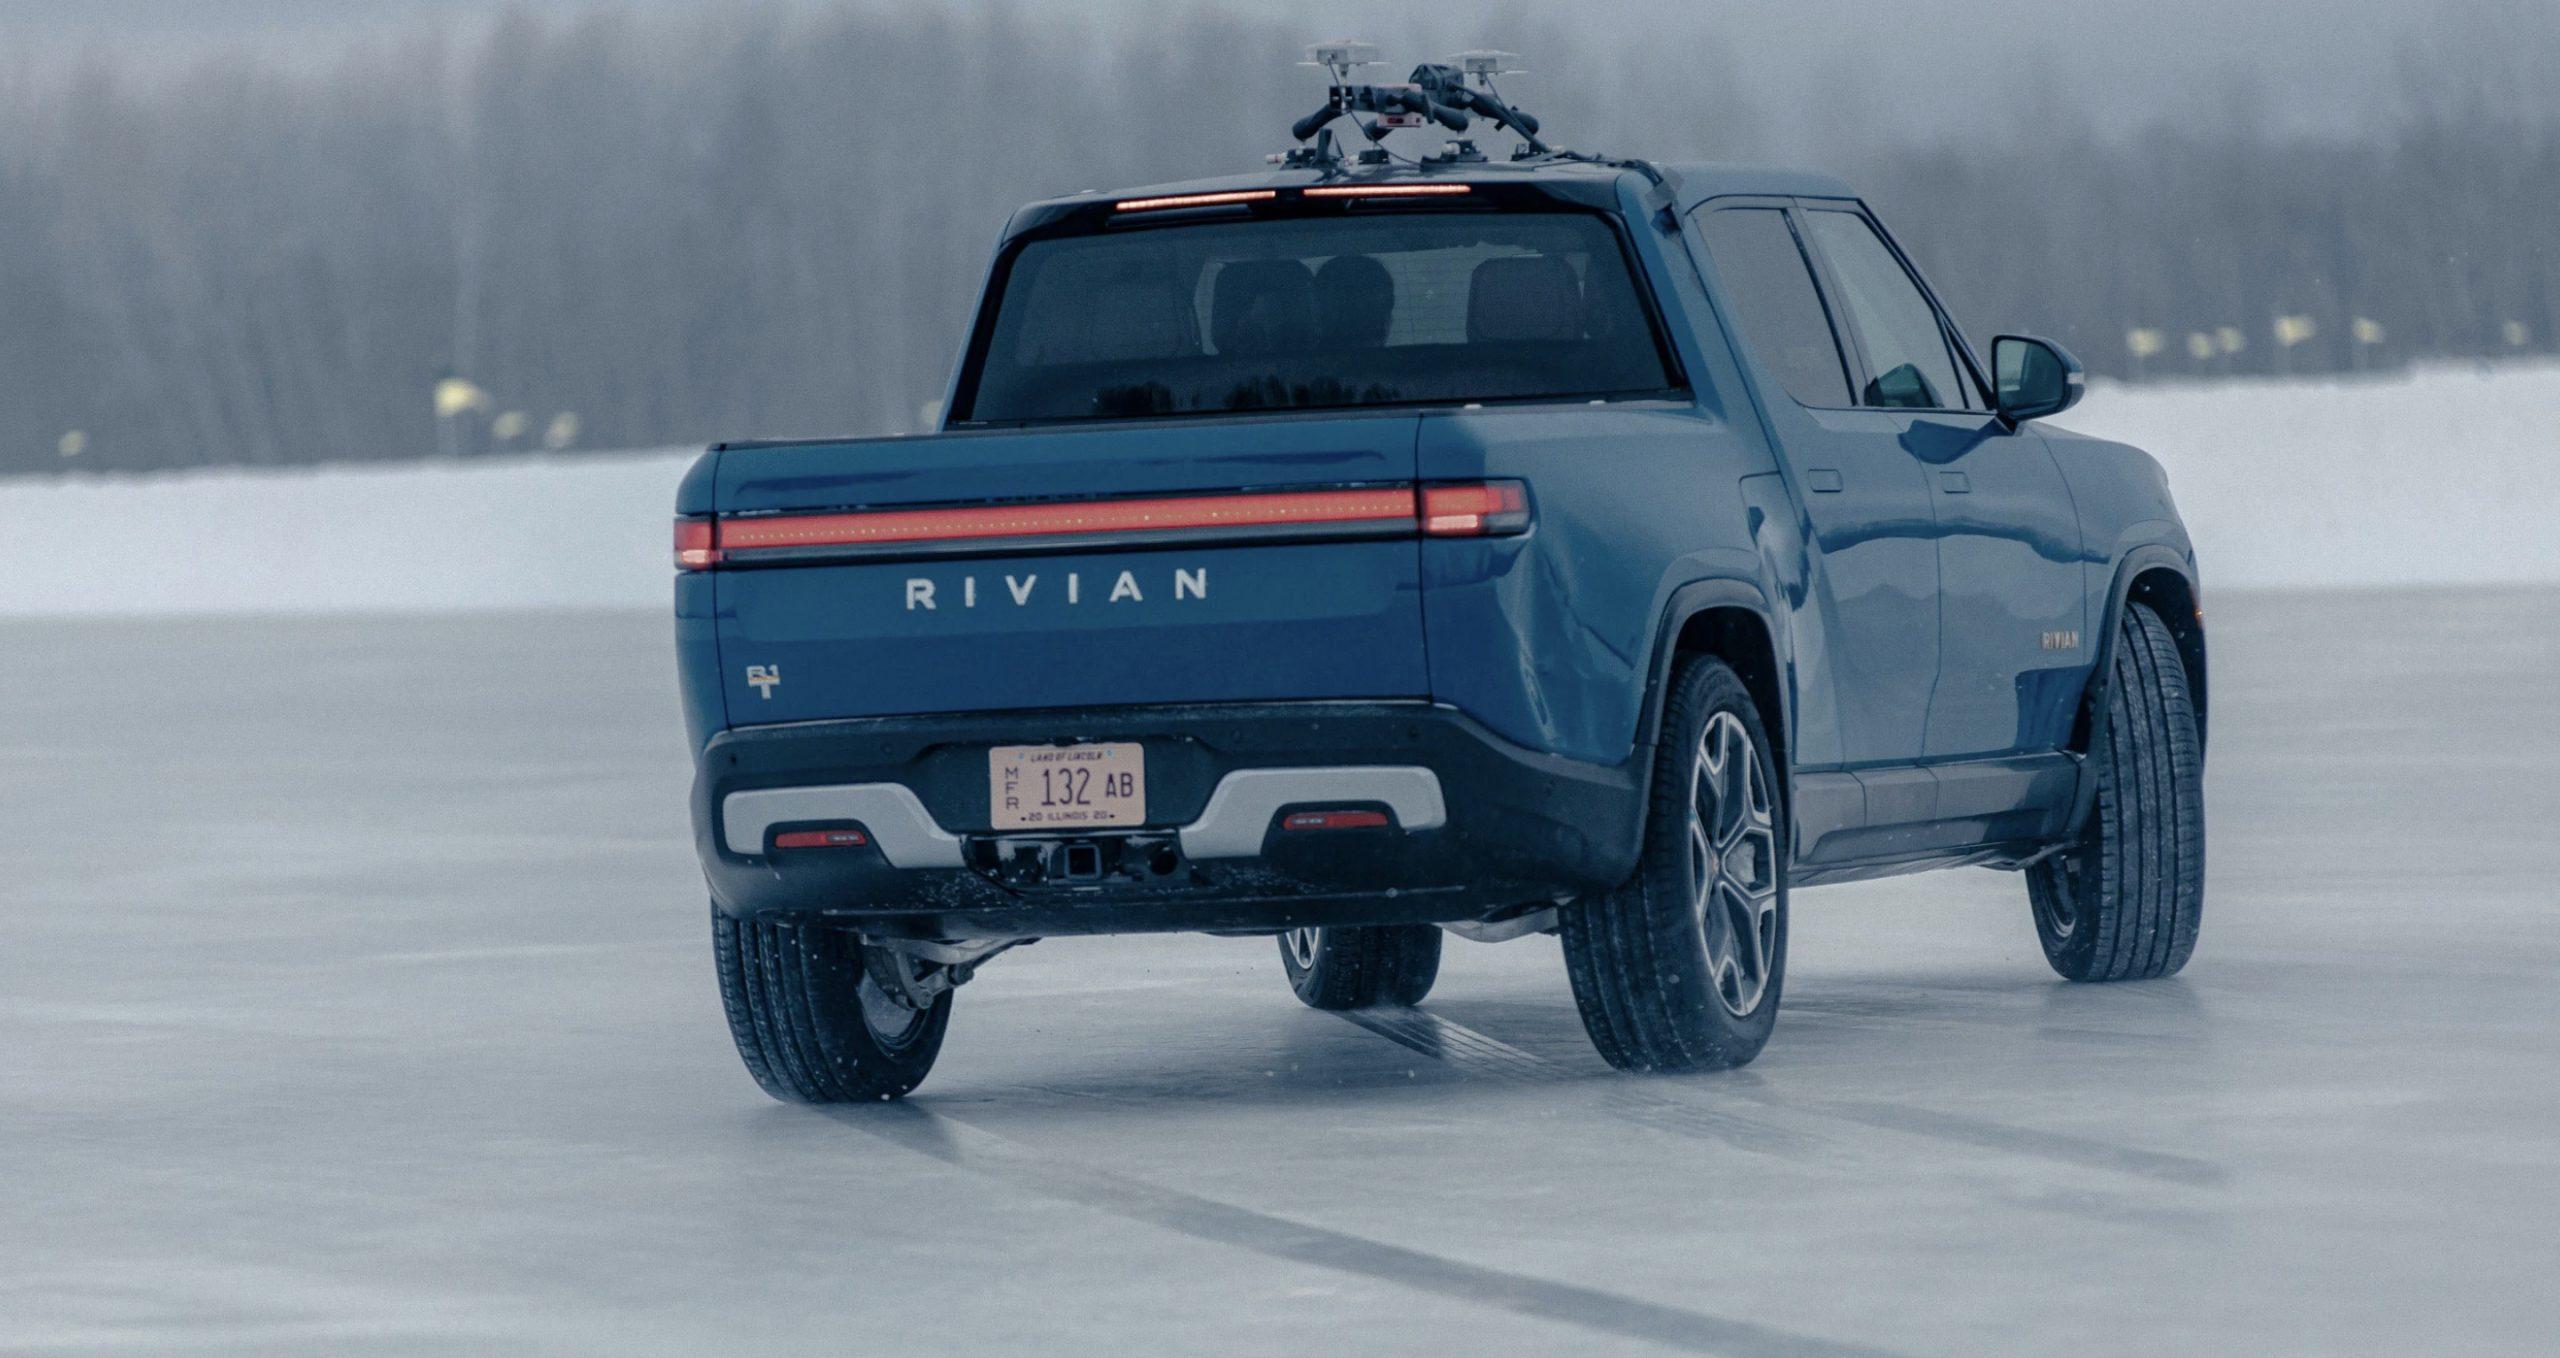 rivian-r1t-r1s-battery-heating-video